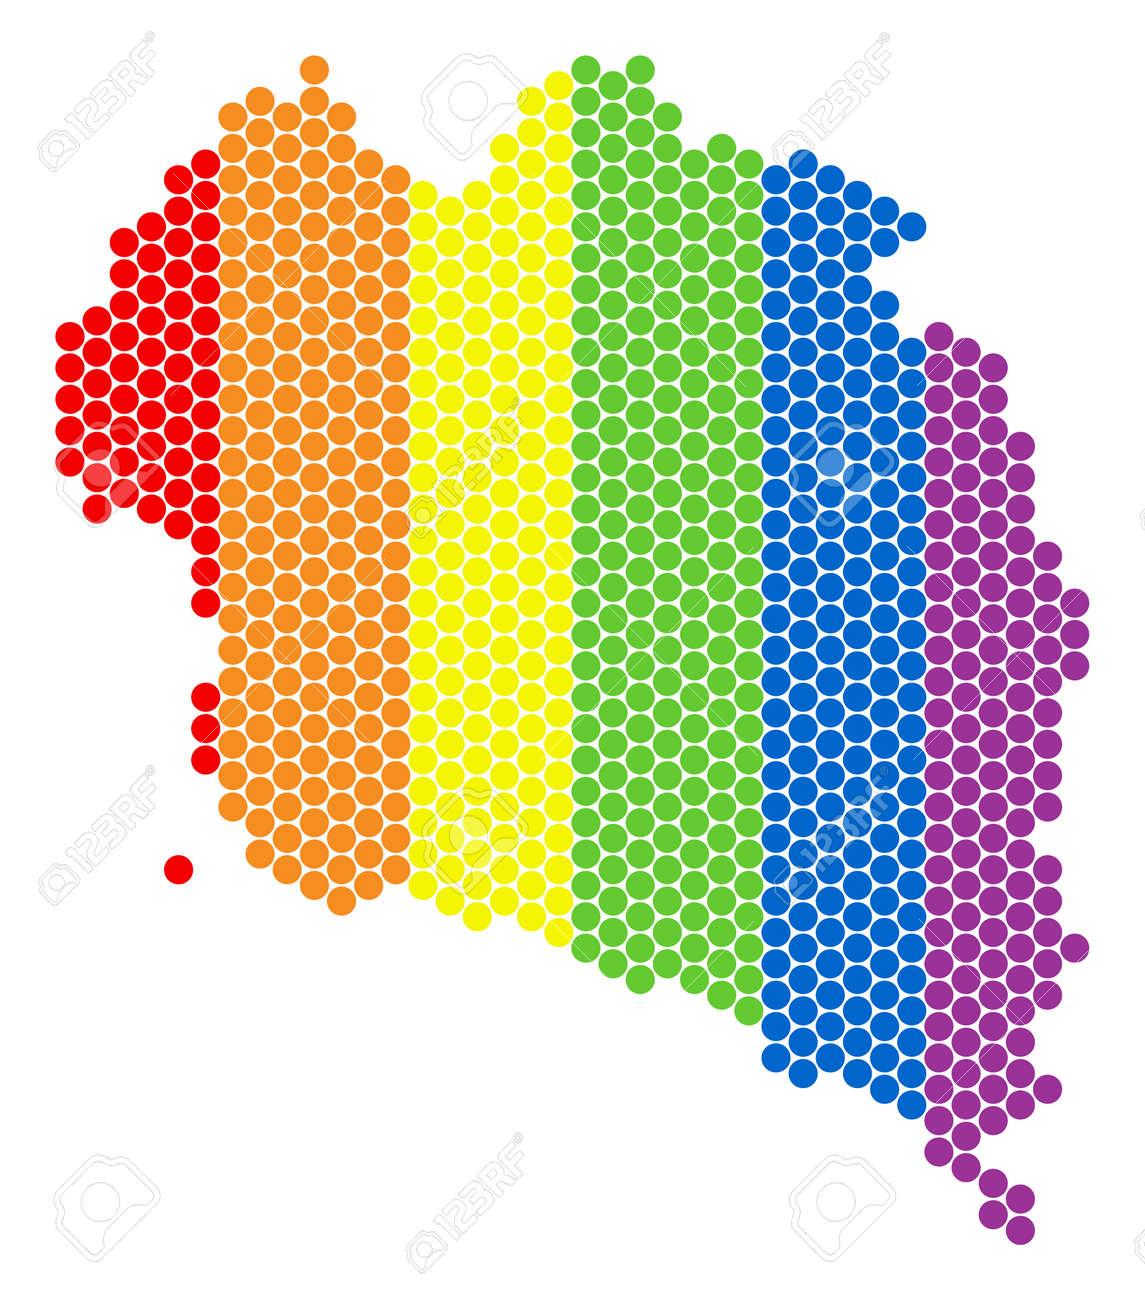 Koh Phangan Thailand Map.A Dotted Lgbt Koh Phangan Thai Island Map For Lesbians Gays